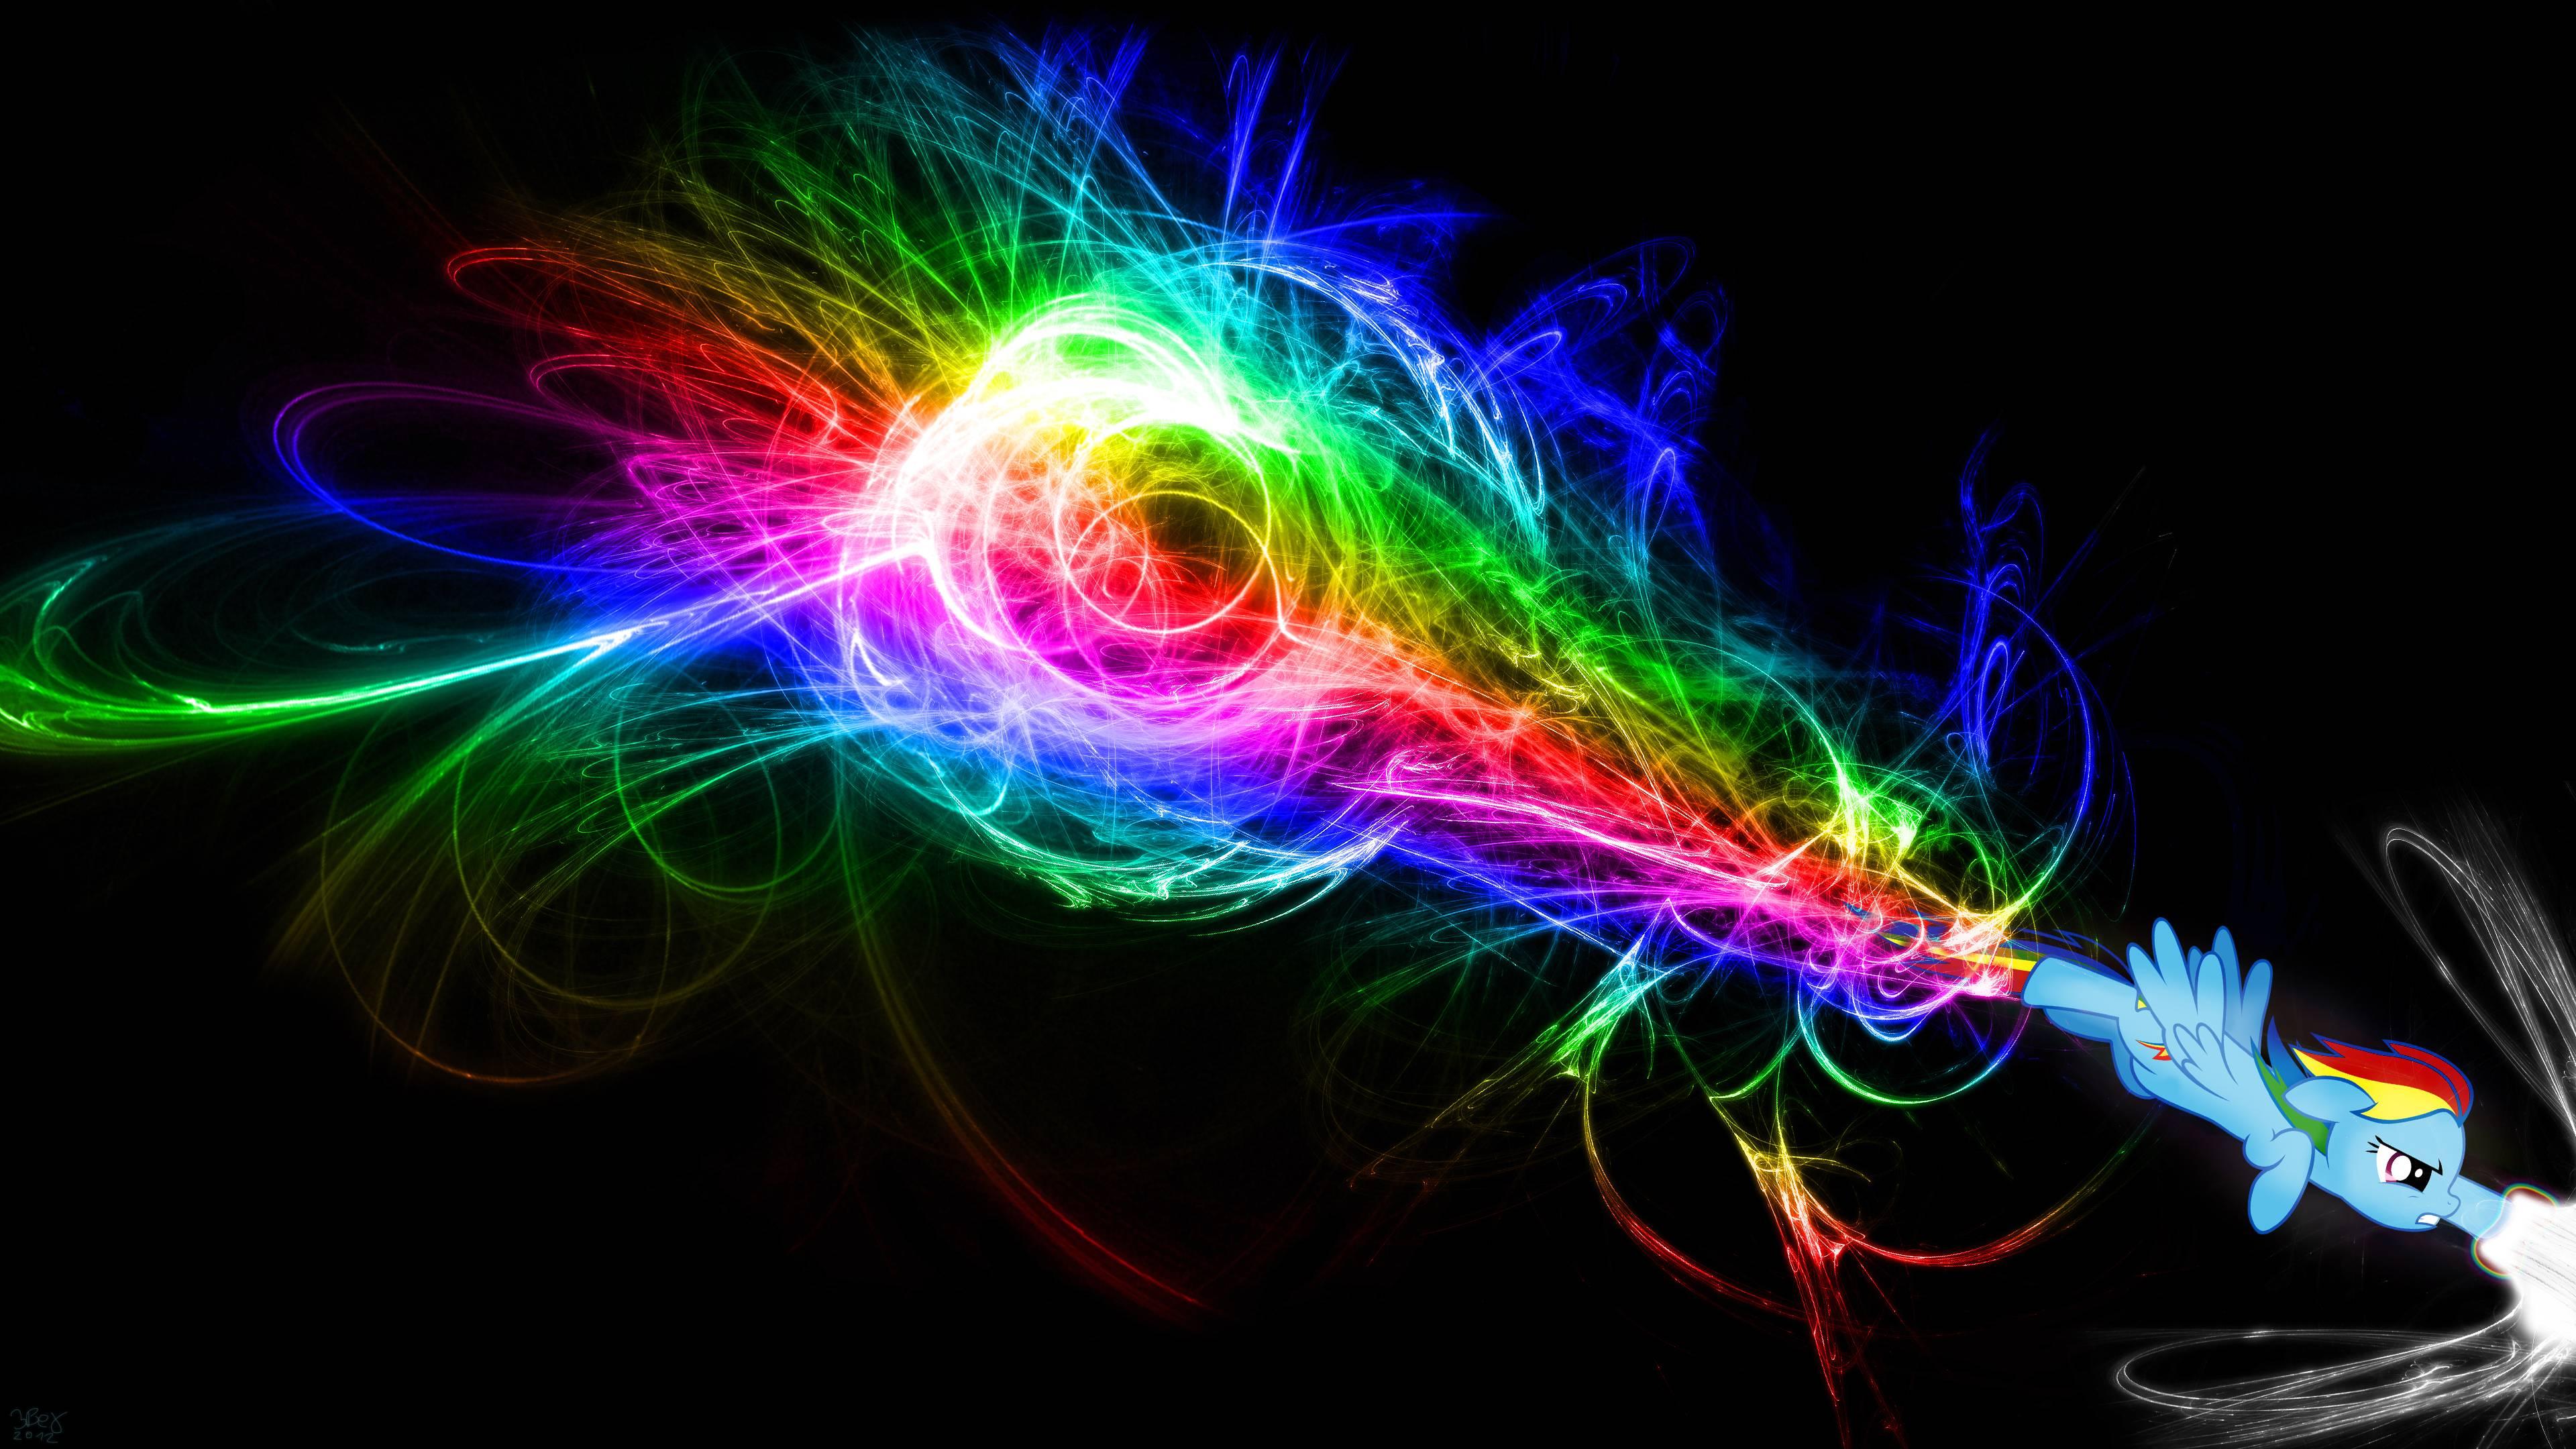 3d Moving Galaxy Wallpaper Rainbow Dash Wallpapers Wallpaper Cave